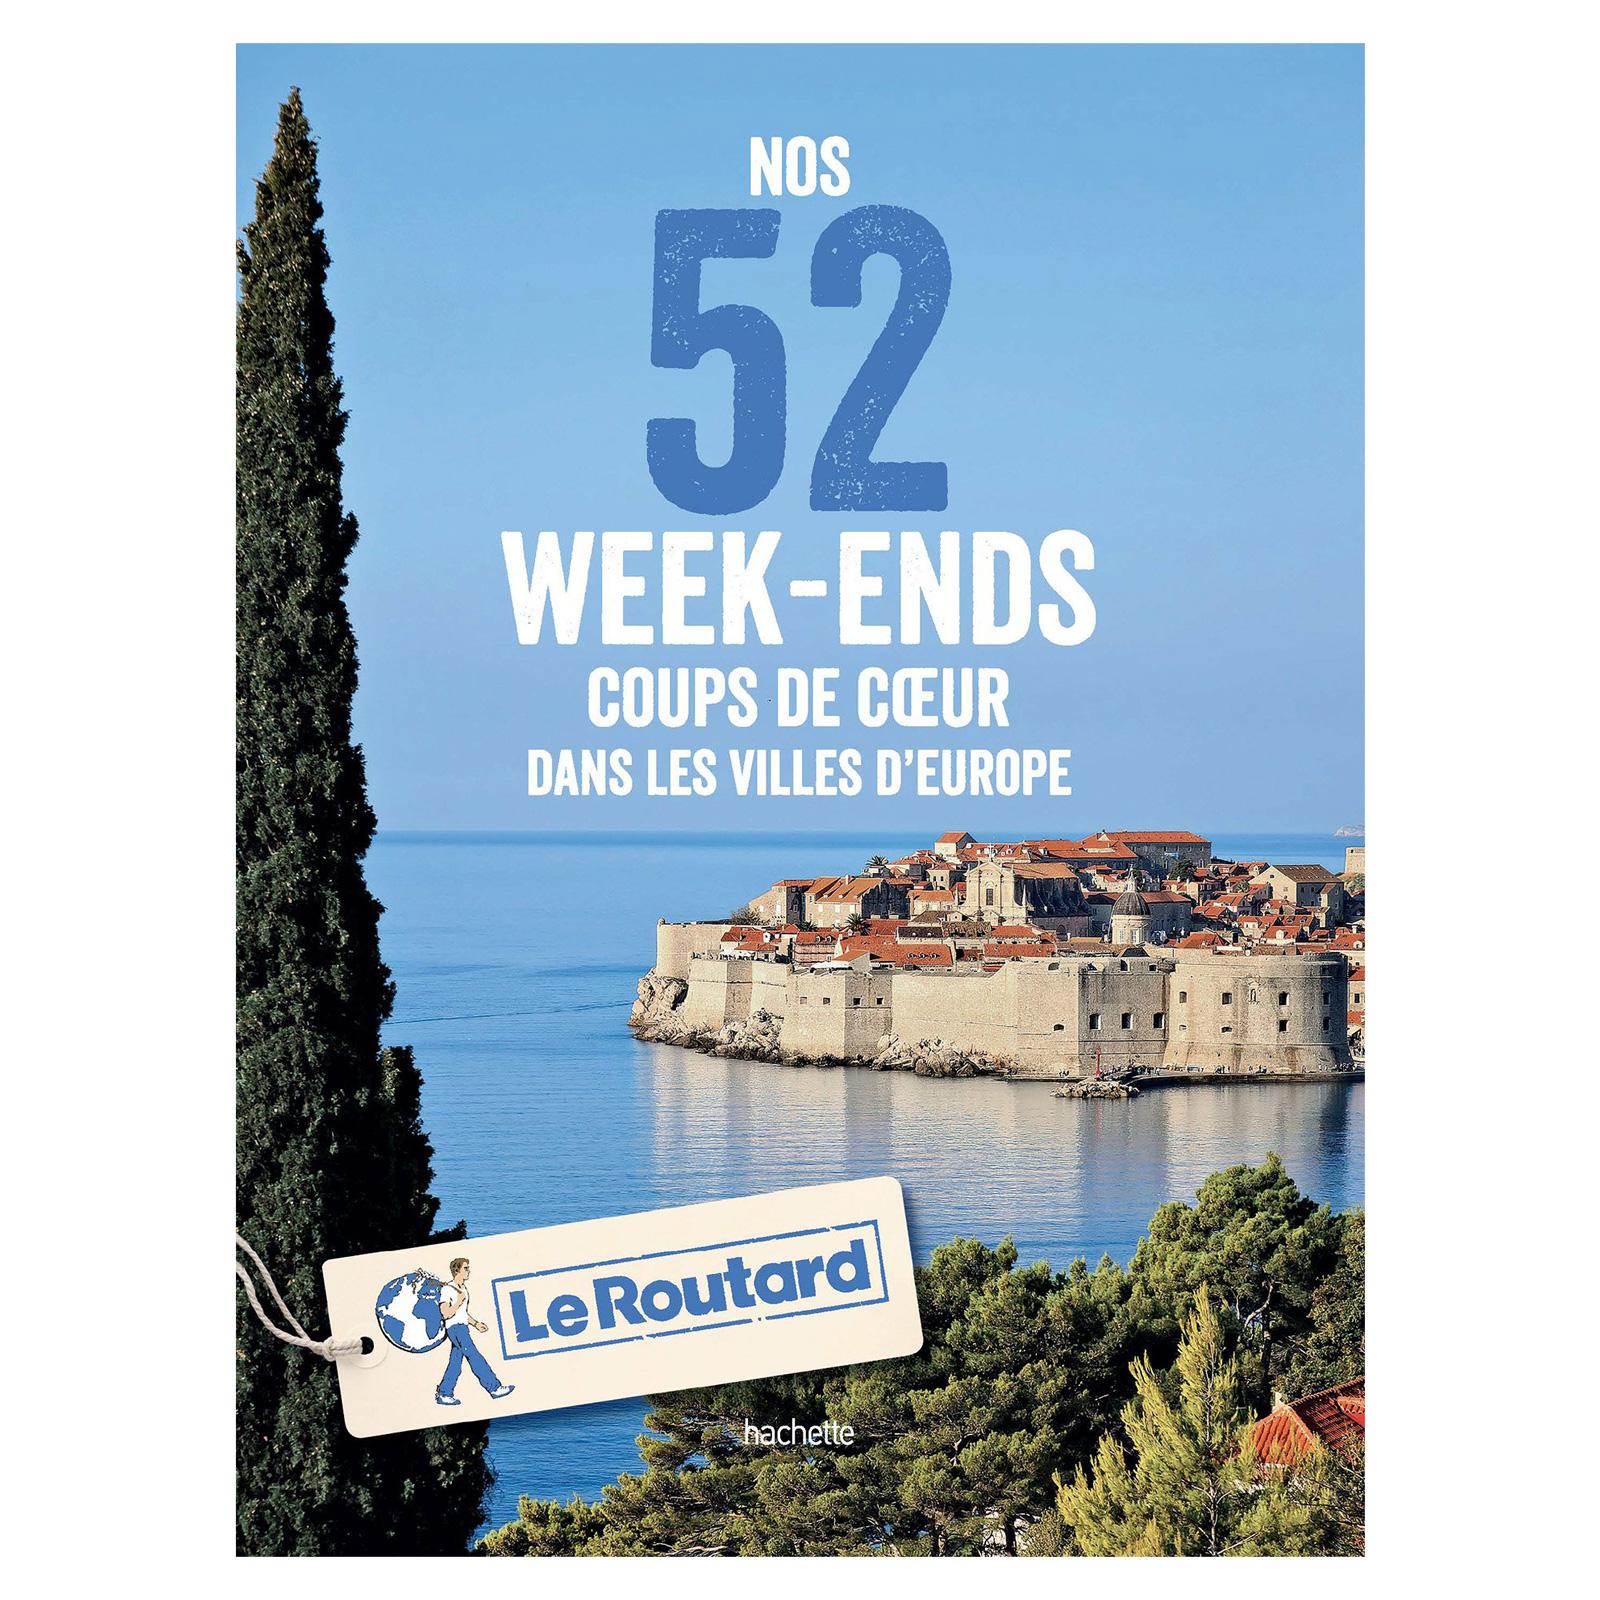 Ends De Coups Nos Coeur Week 52 rBWxedCo